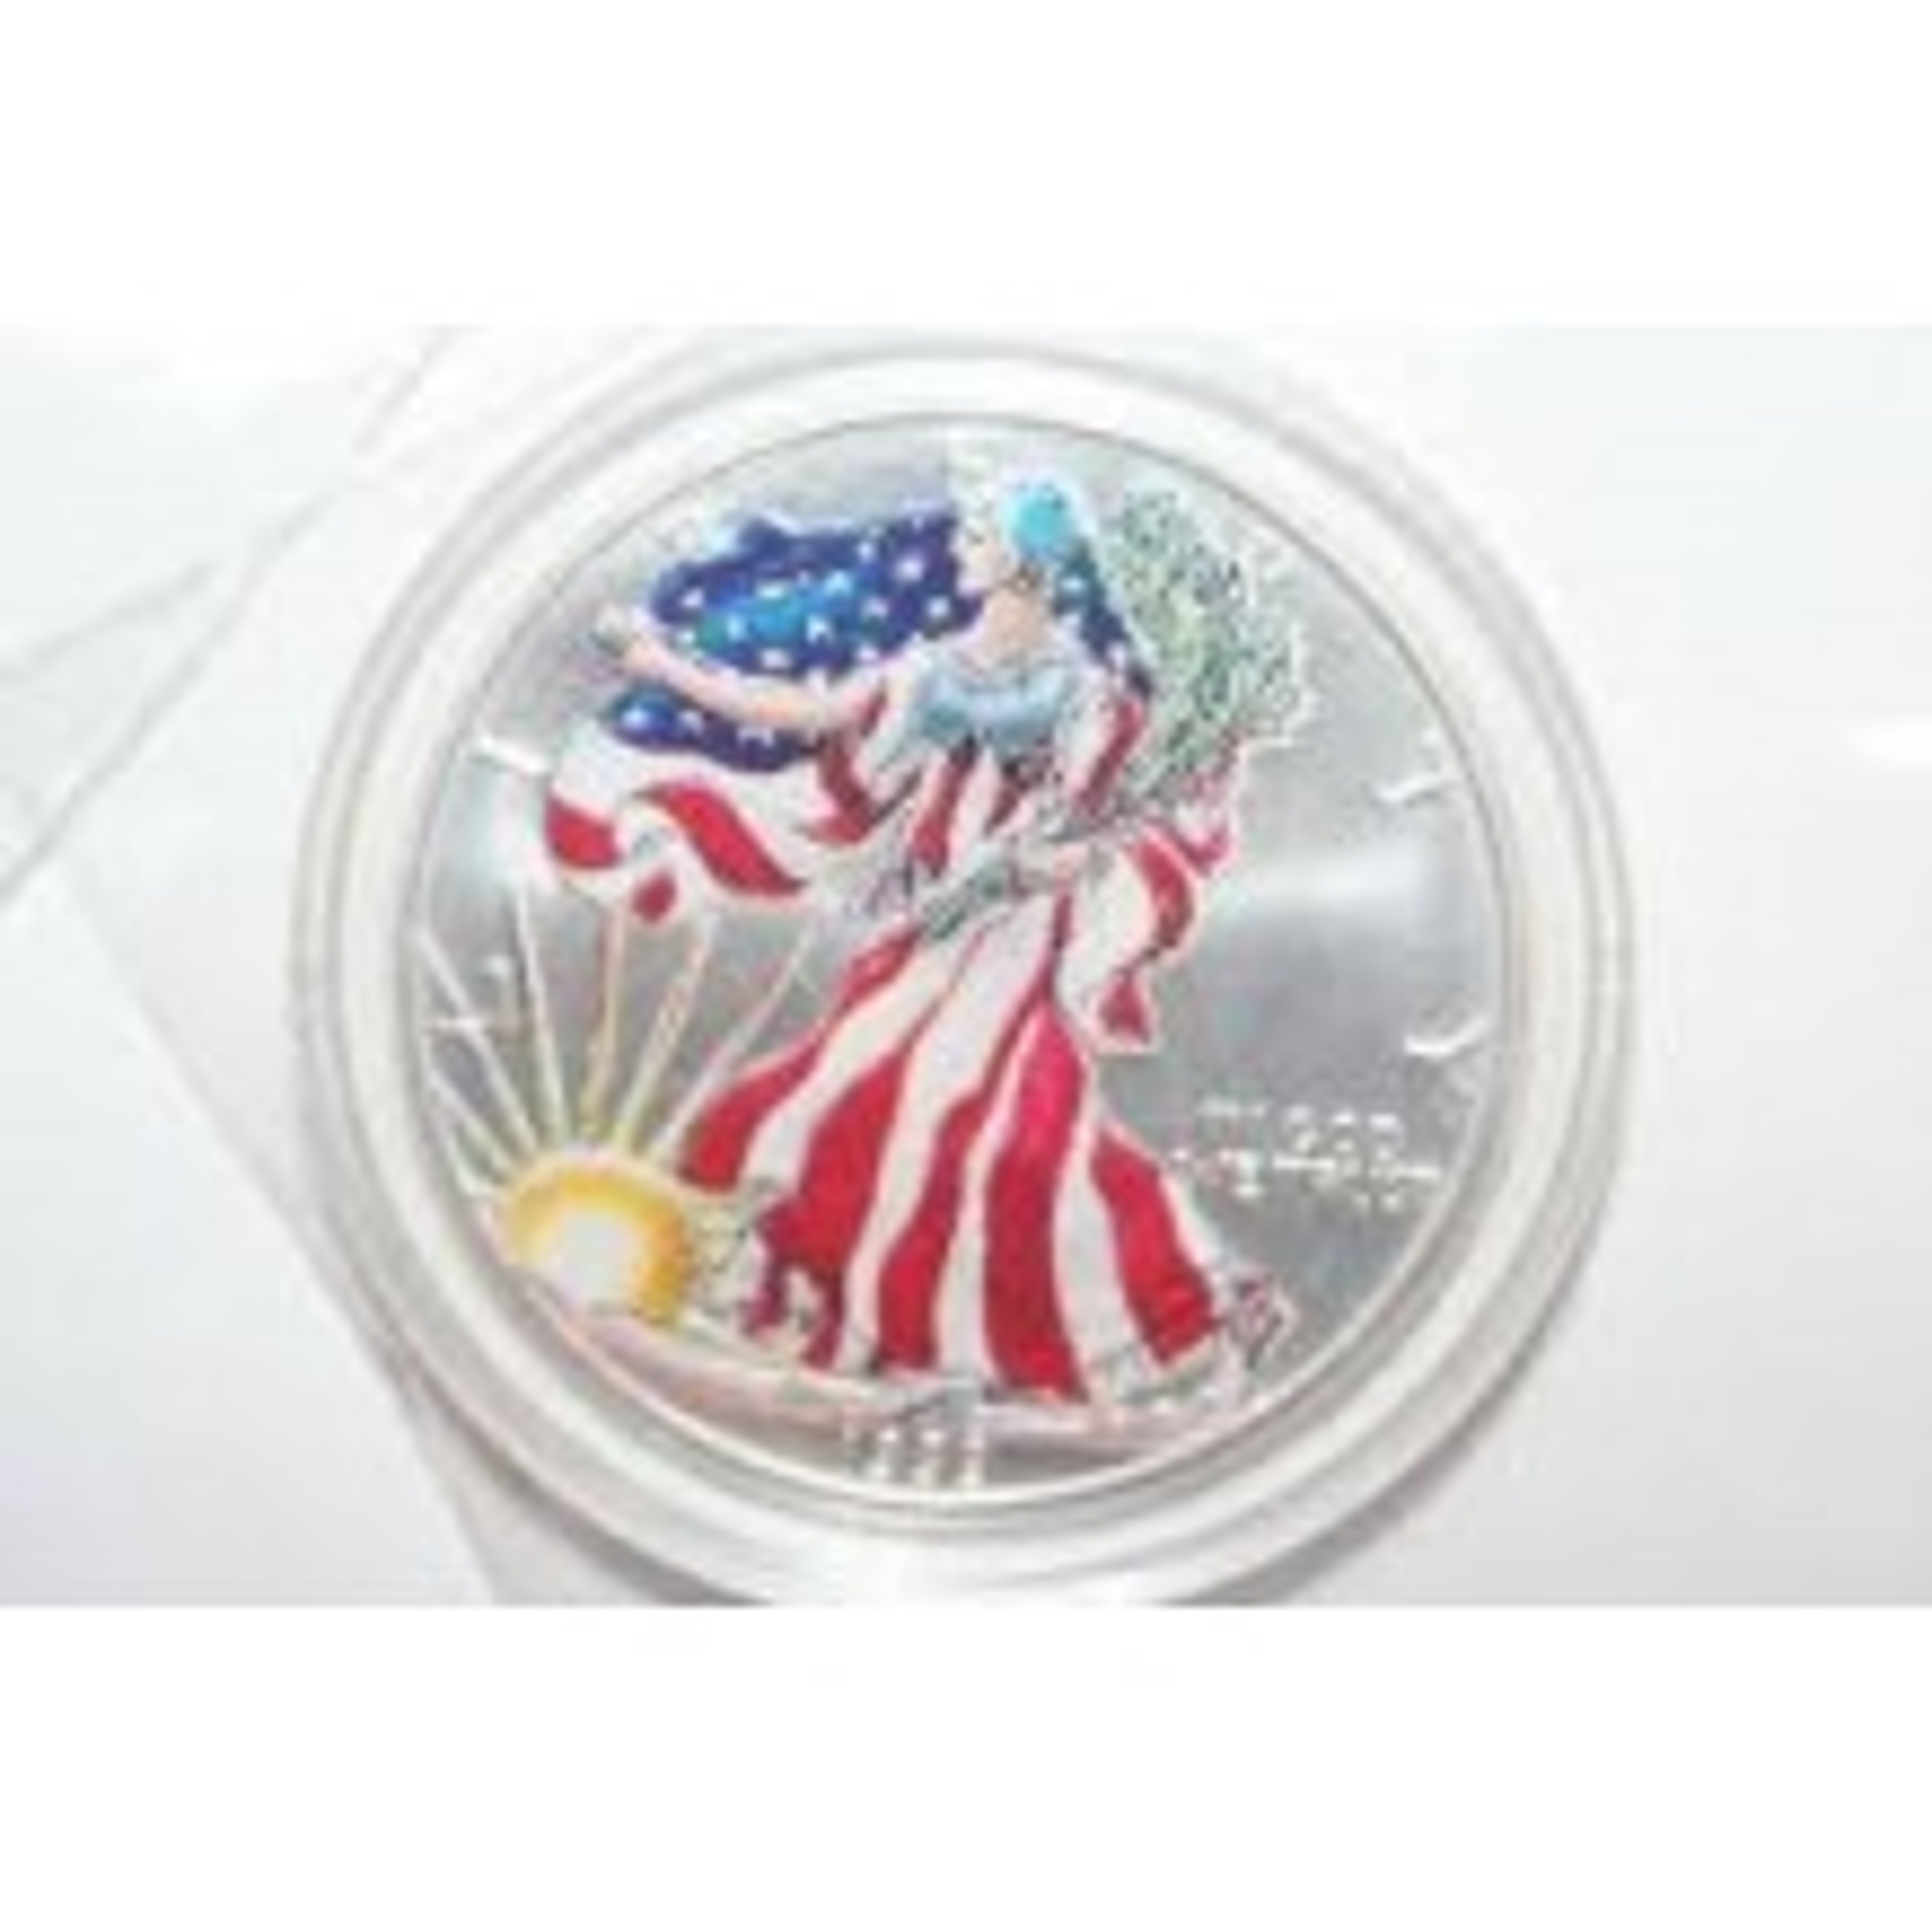 Silver Eagle gekleurde zilveren munten